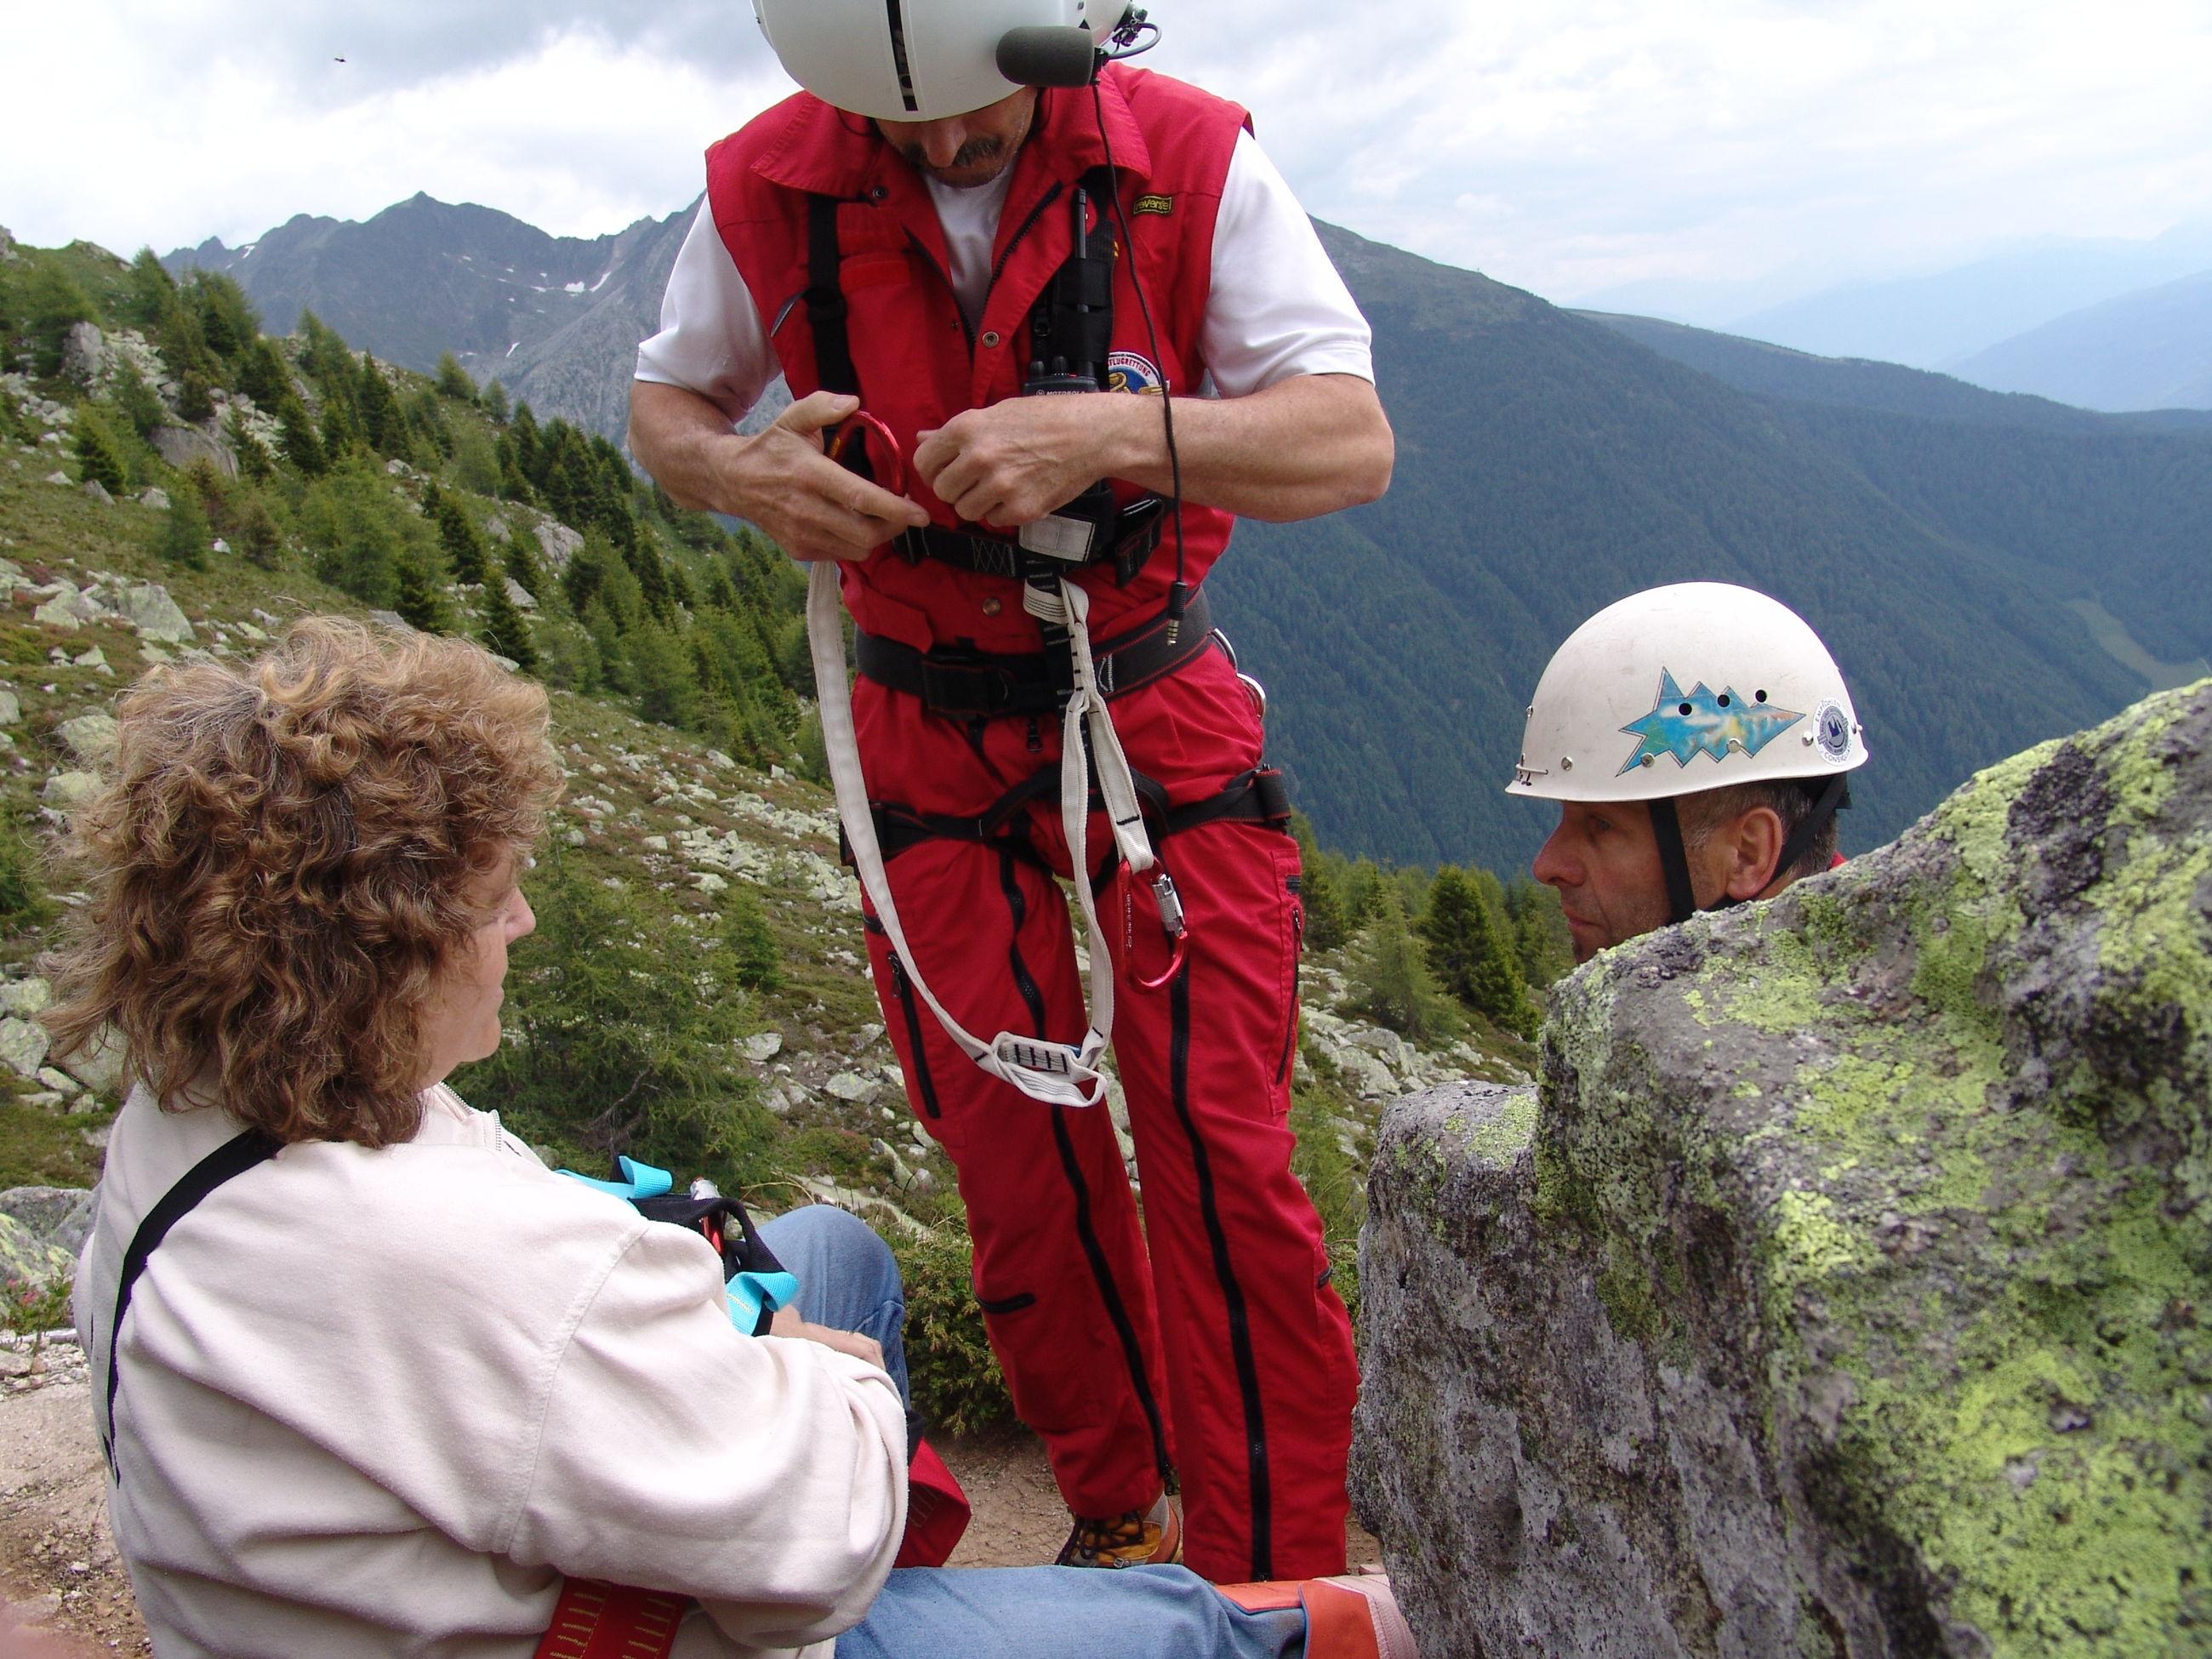 TOURIST STANDING ON MOUNTAIN LANDSCAPE